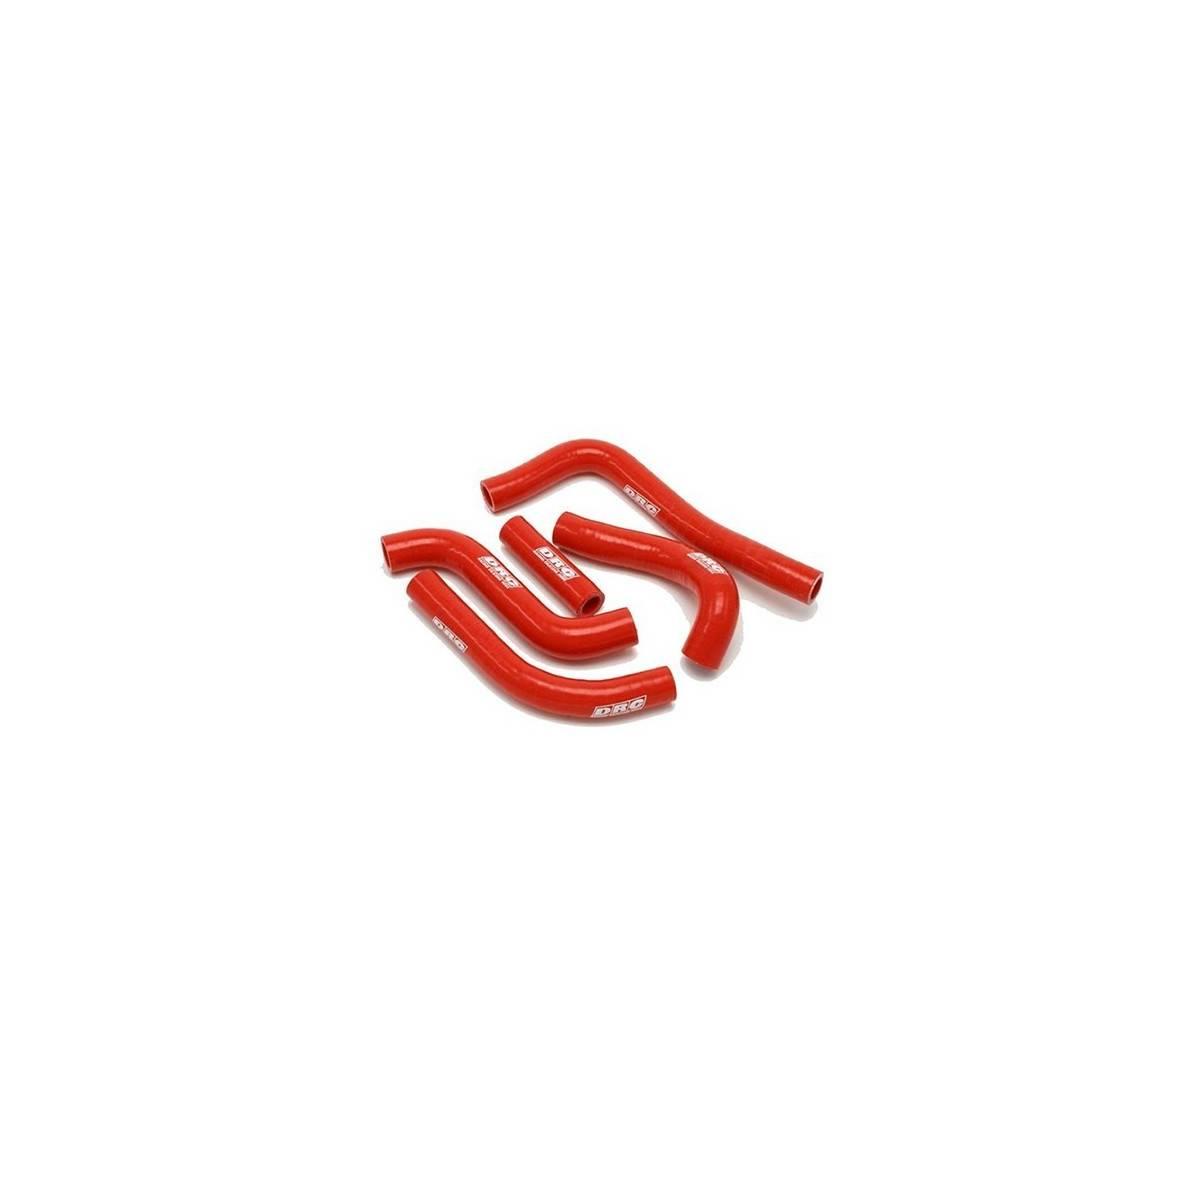 D47.01.113 - Kit Manguitos Radiador Honda Crm250R ´93-96 Rojo